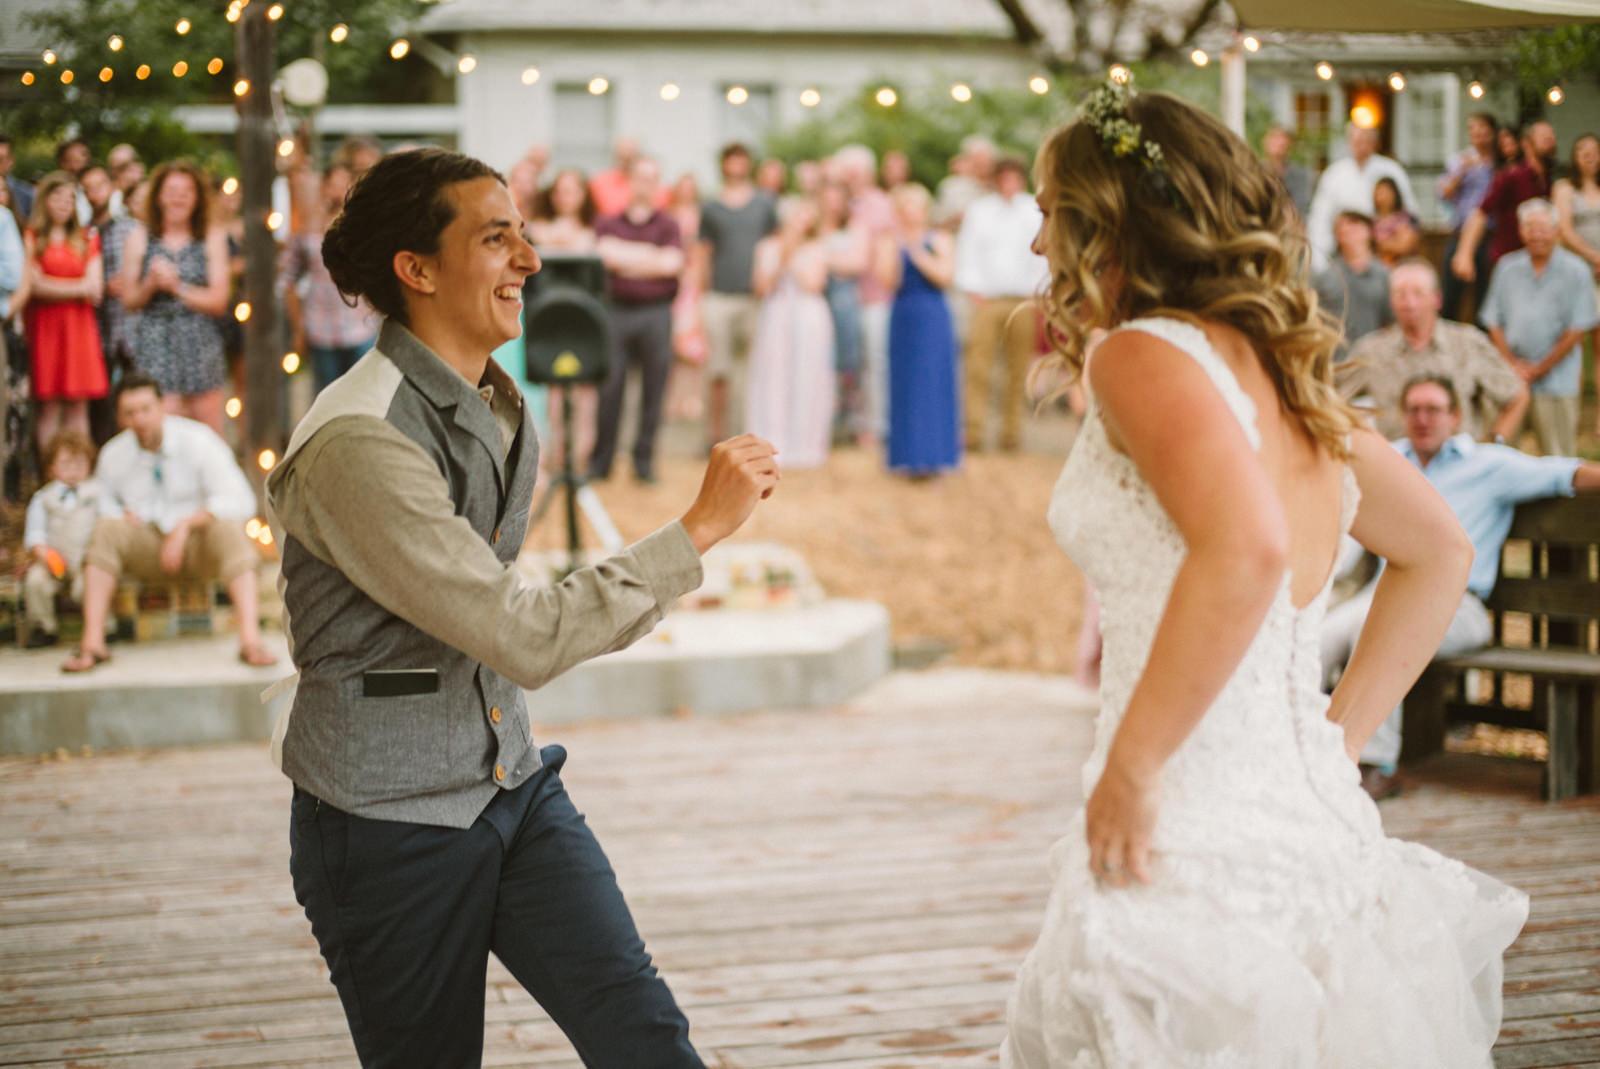 rivers-bend-retreat-wedding-099 RIVER'S BEND RETREAT WEDDING